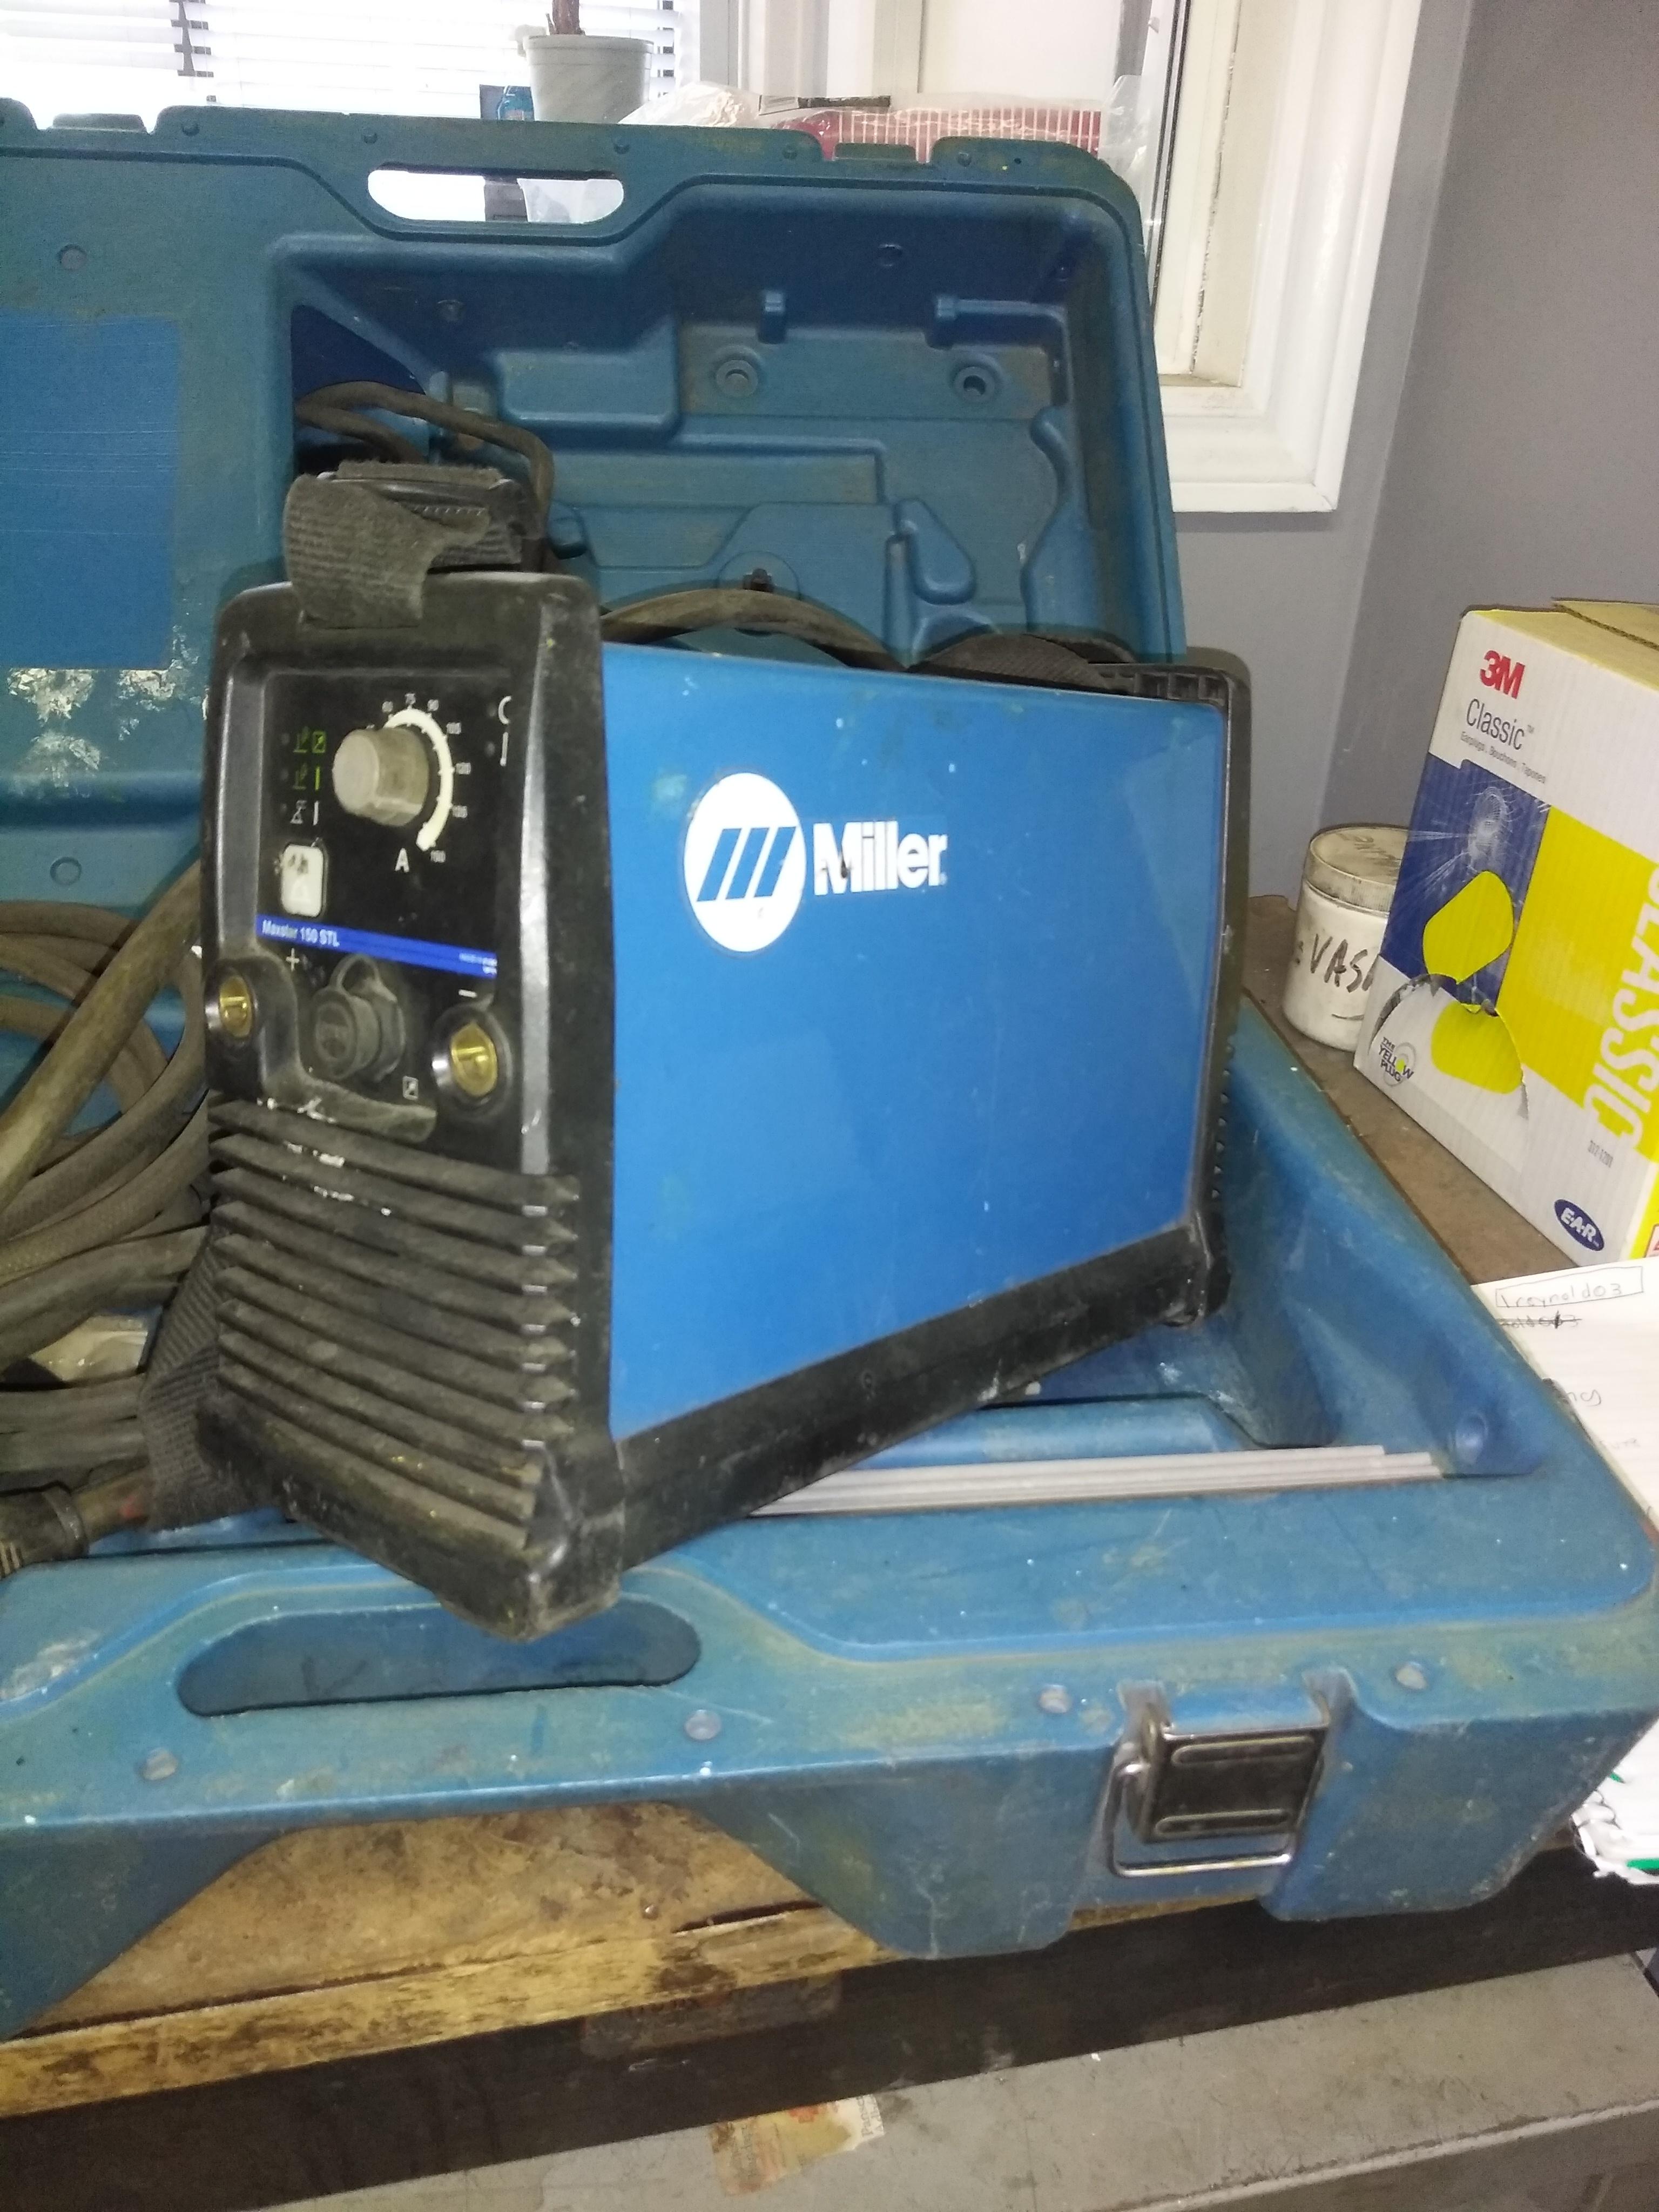 Miller Welding Machine  Quantity: 2 Cost: $1500